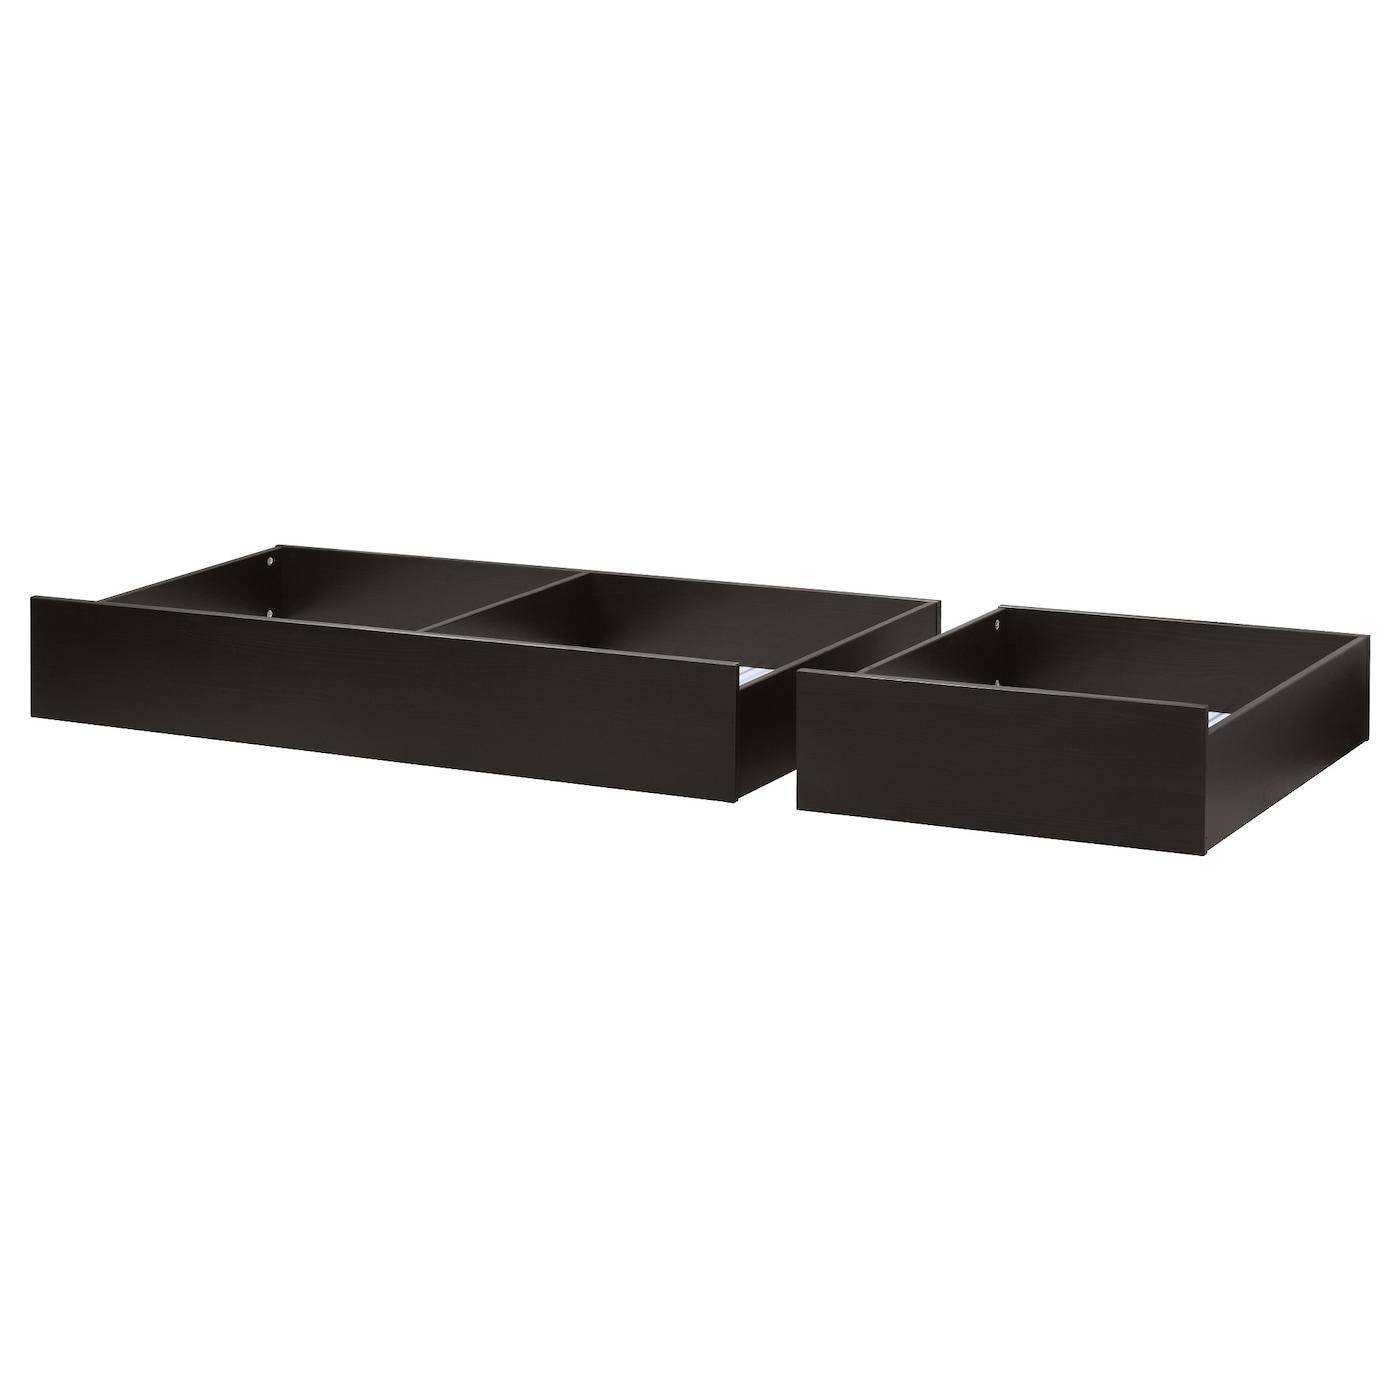 Hemnes Bed Storage Box Set Of 2 Black Brown Double Ikea